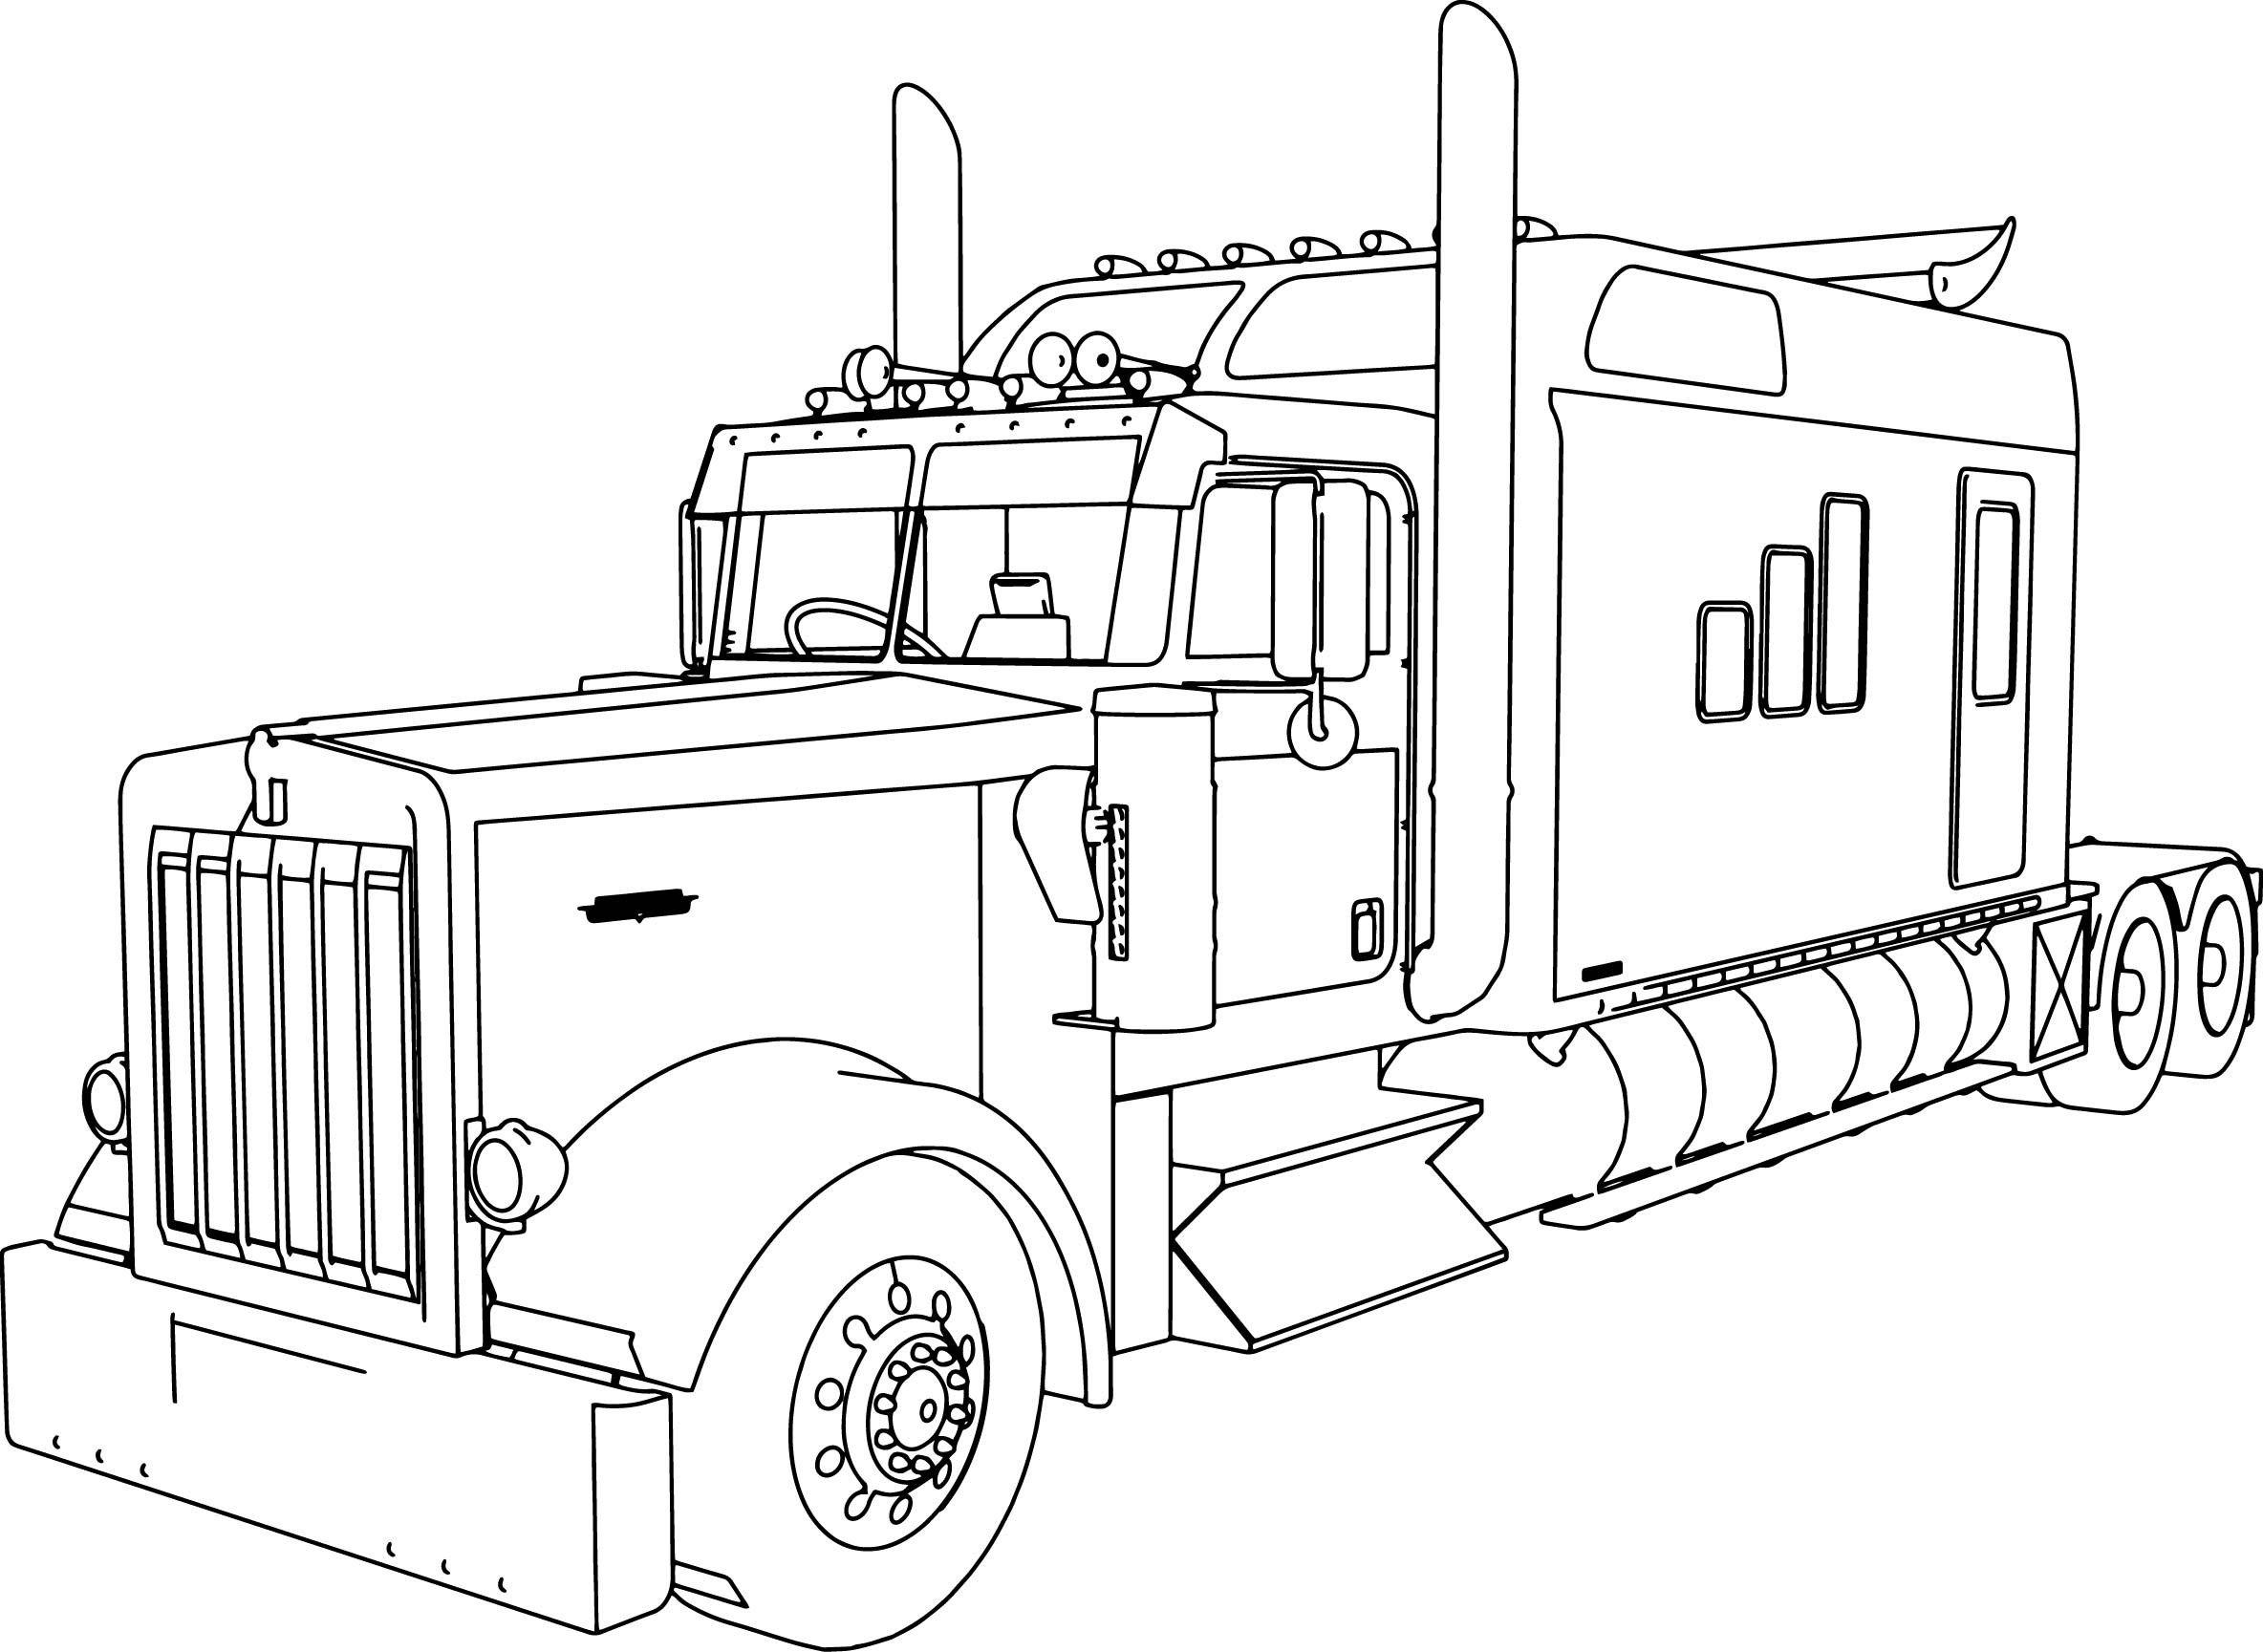 Semi Truck Coloring Pages Truck Coloring Pages Monster Truck Coloring Pages Cars Coloring Pages